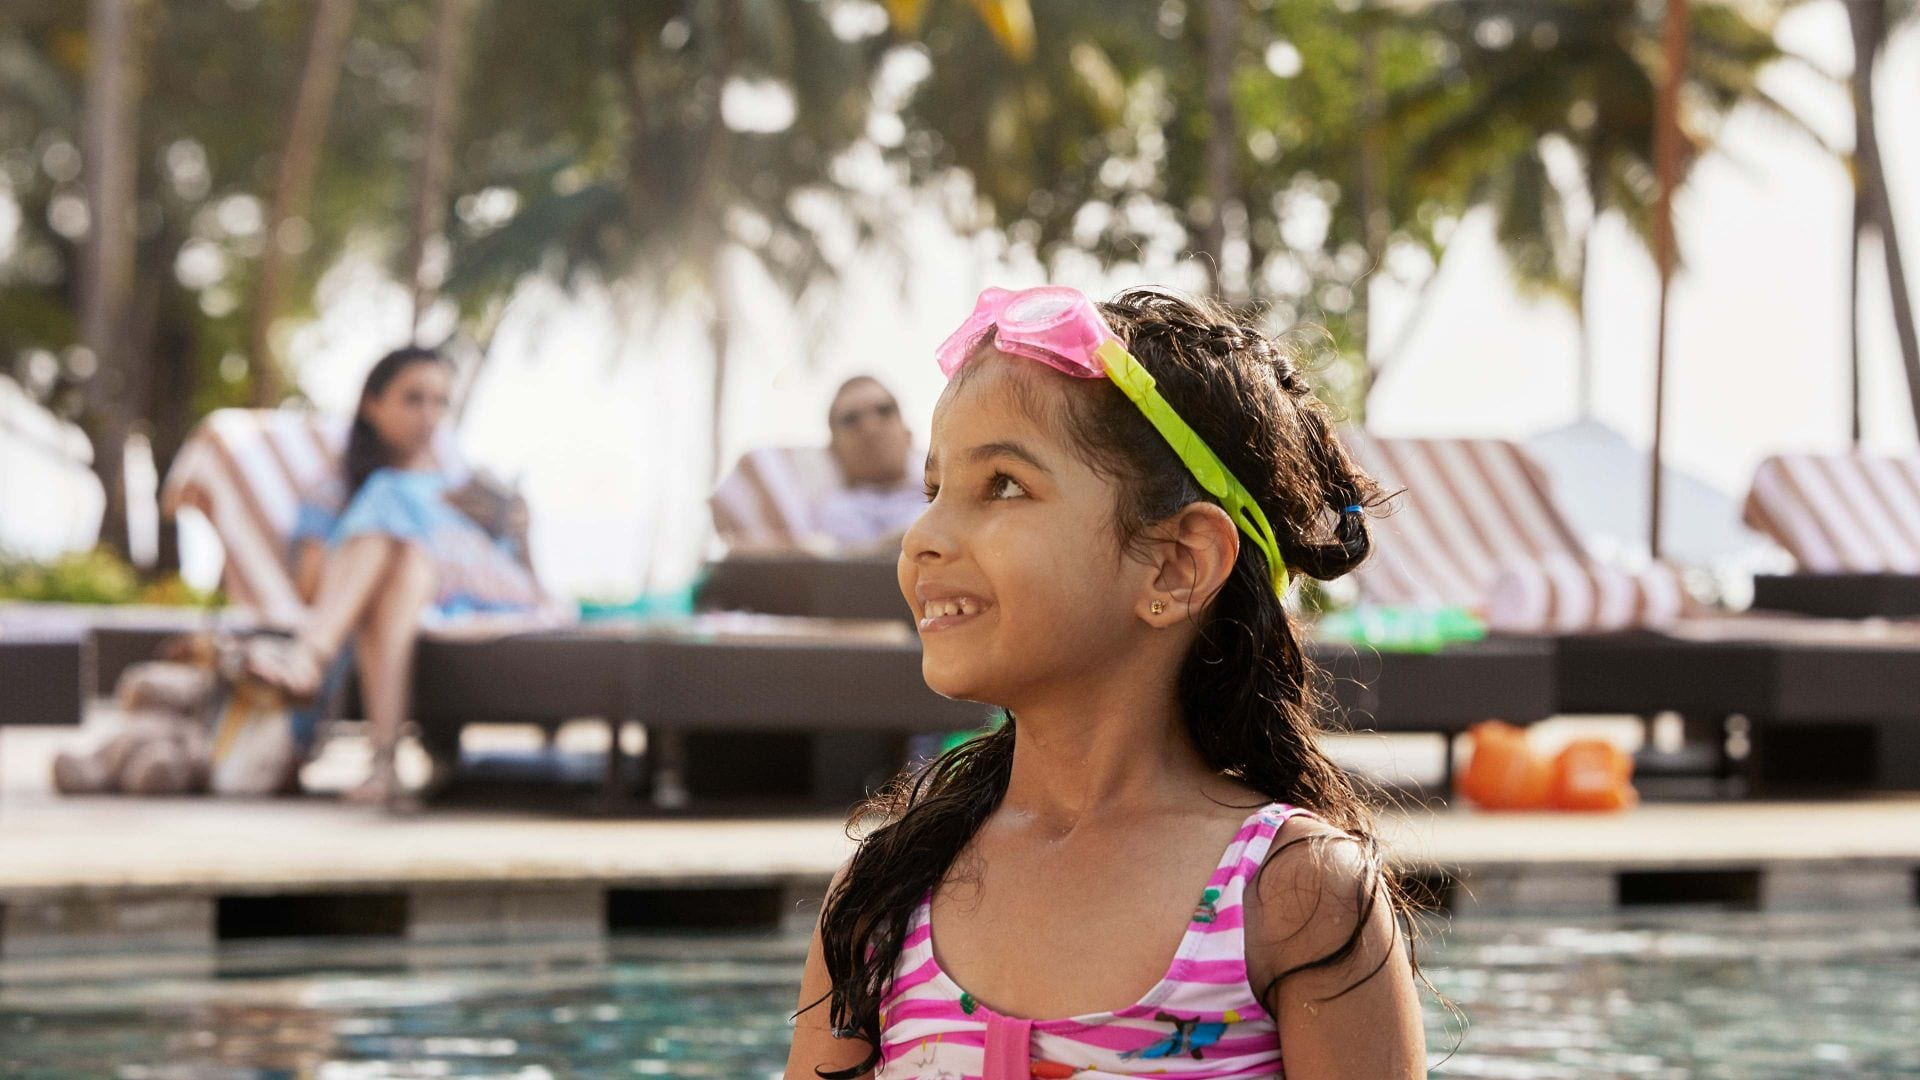 Girl in Orlando Hotel Pool Hyatt Regency